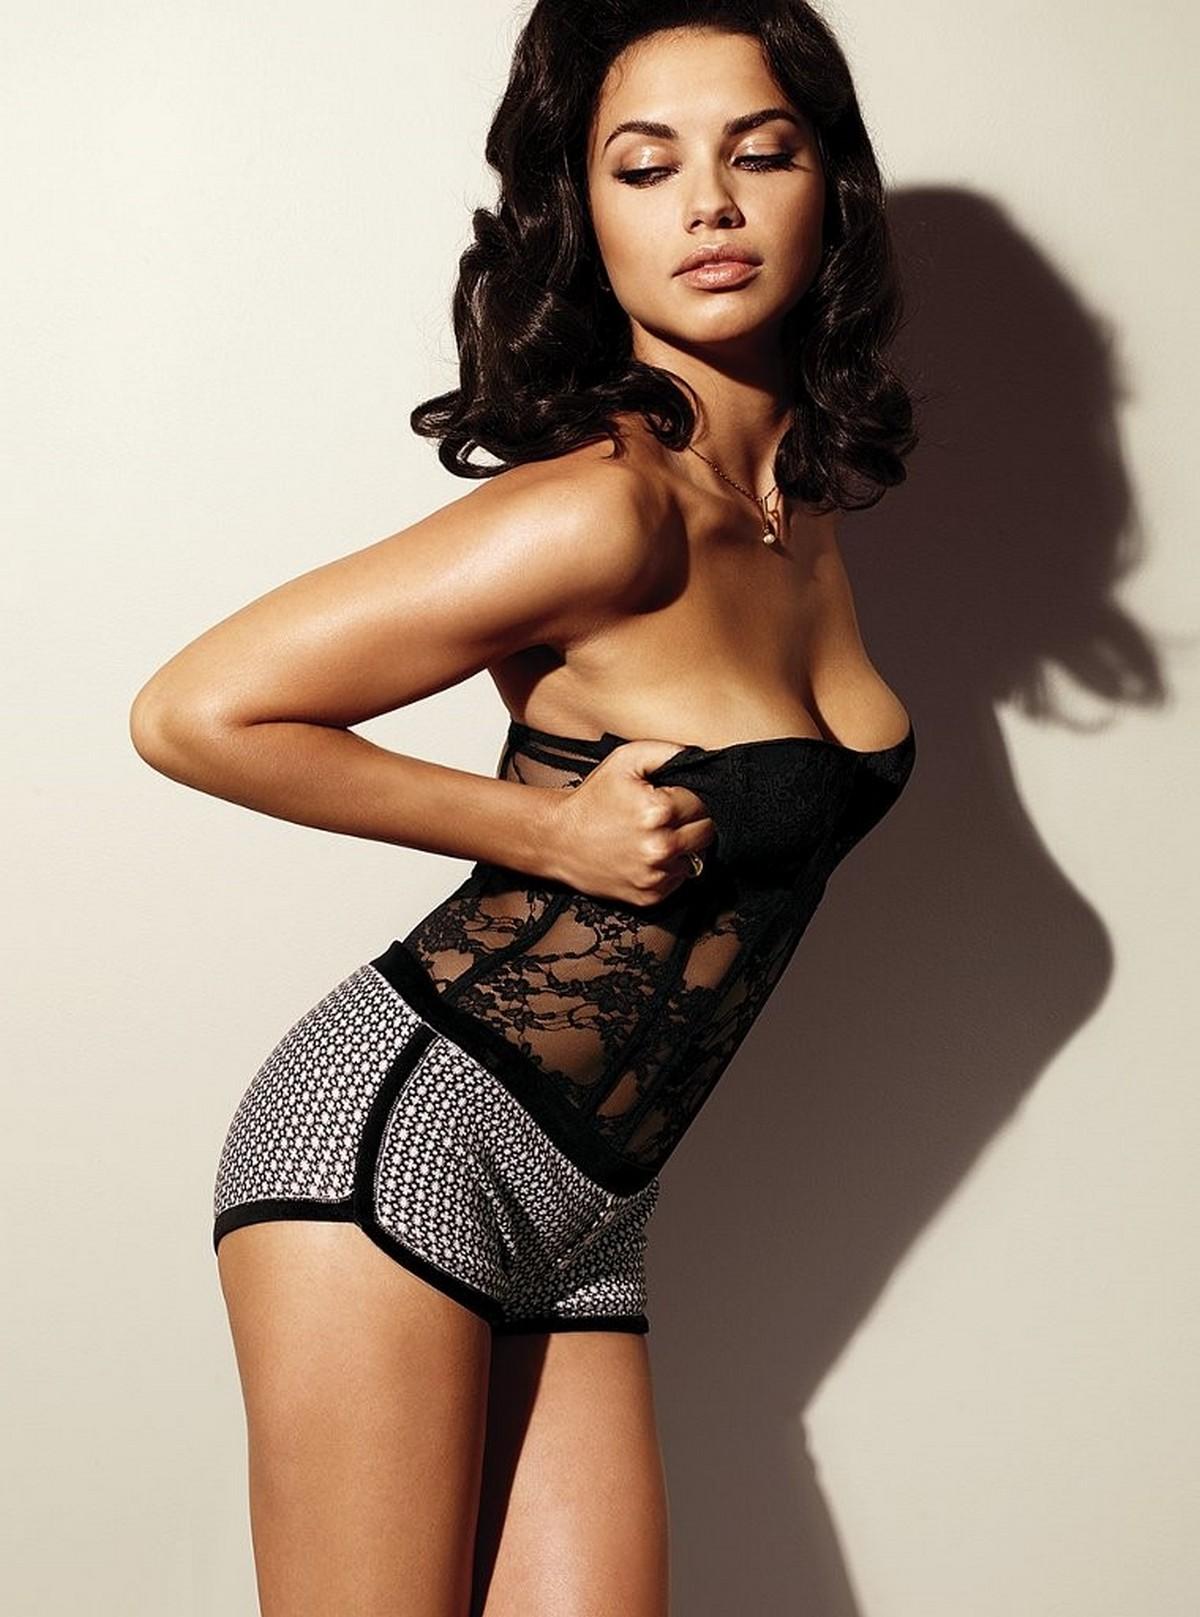 actrices eroticas colombianas